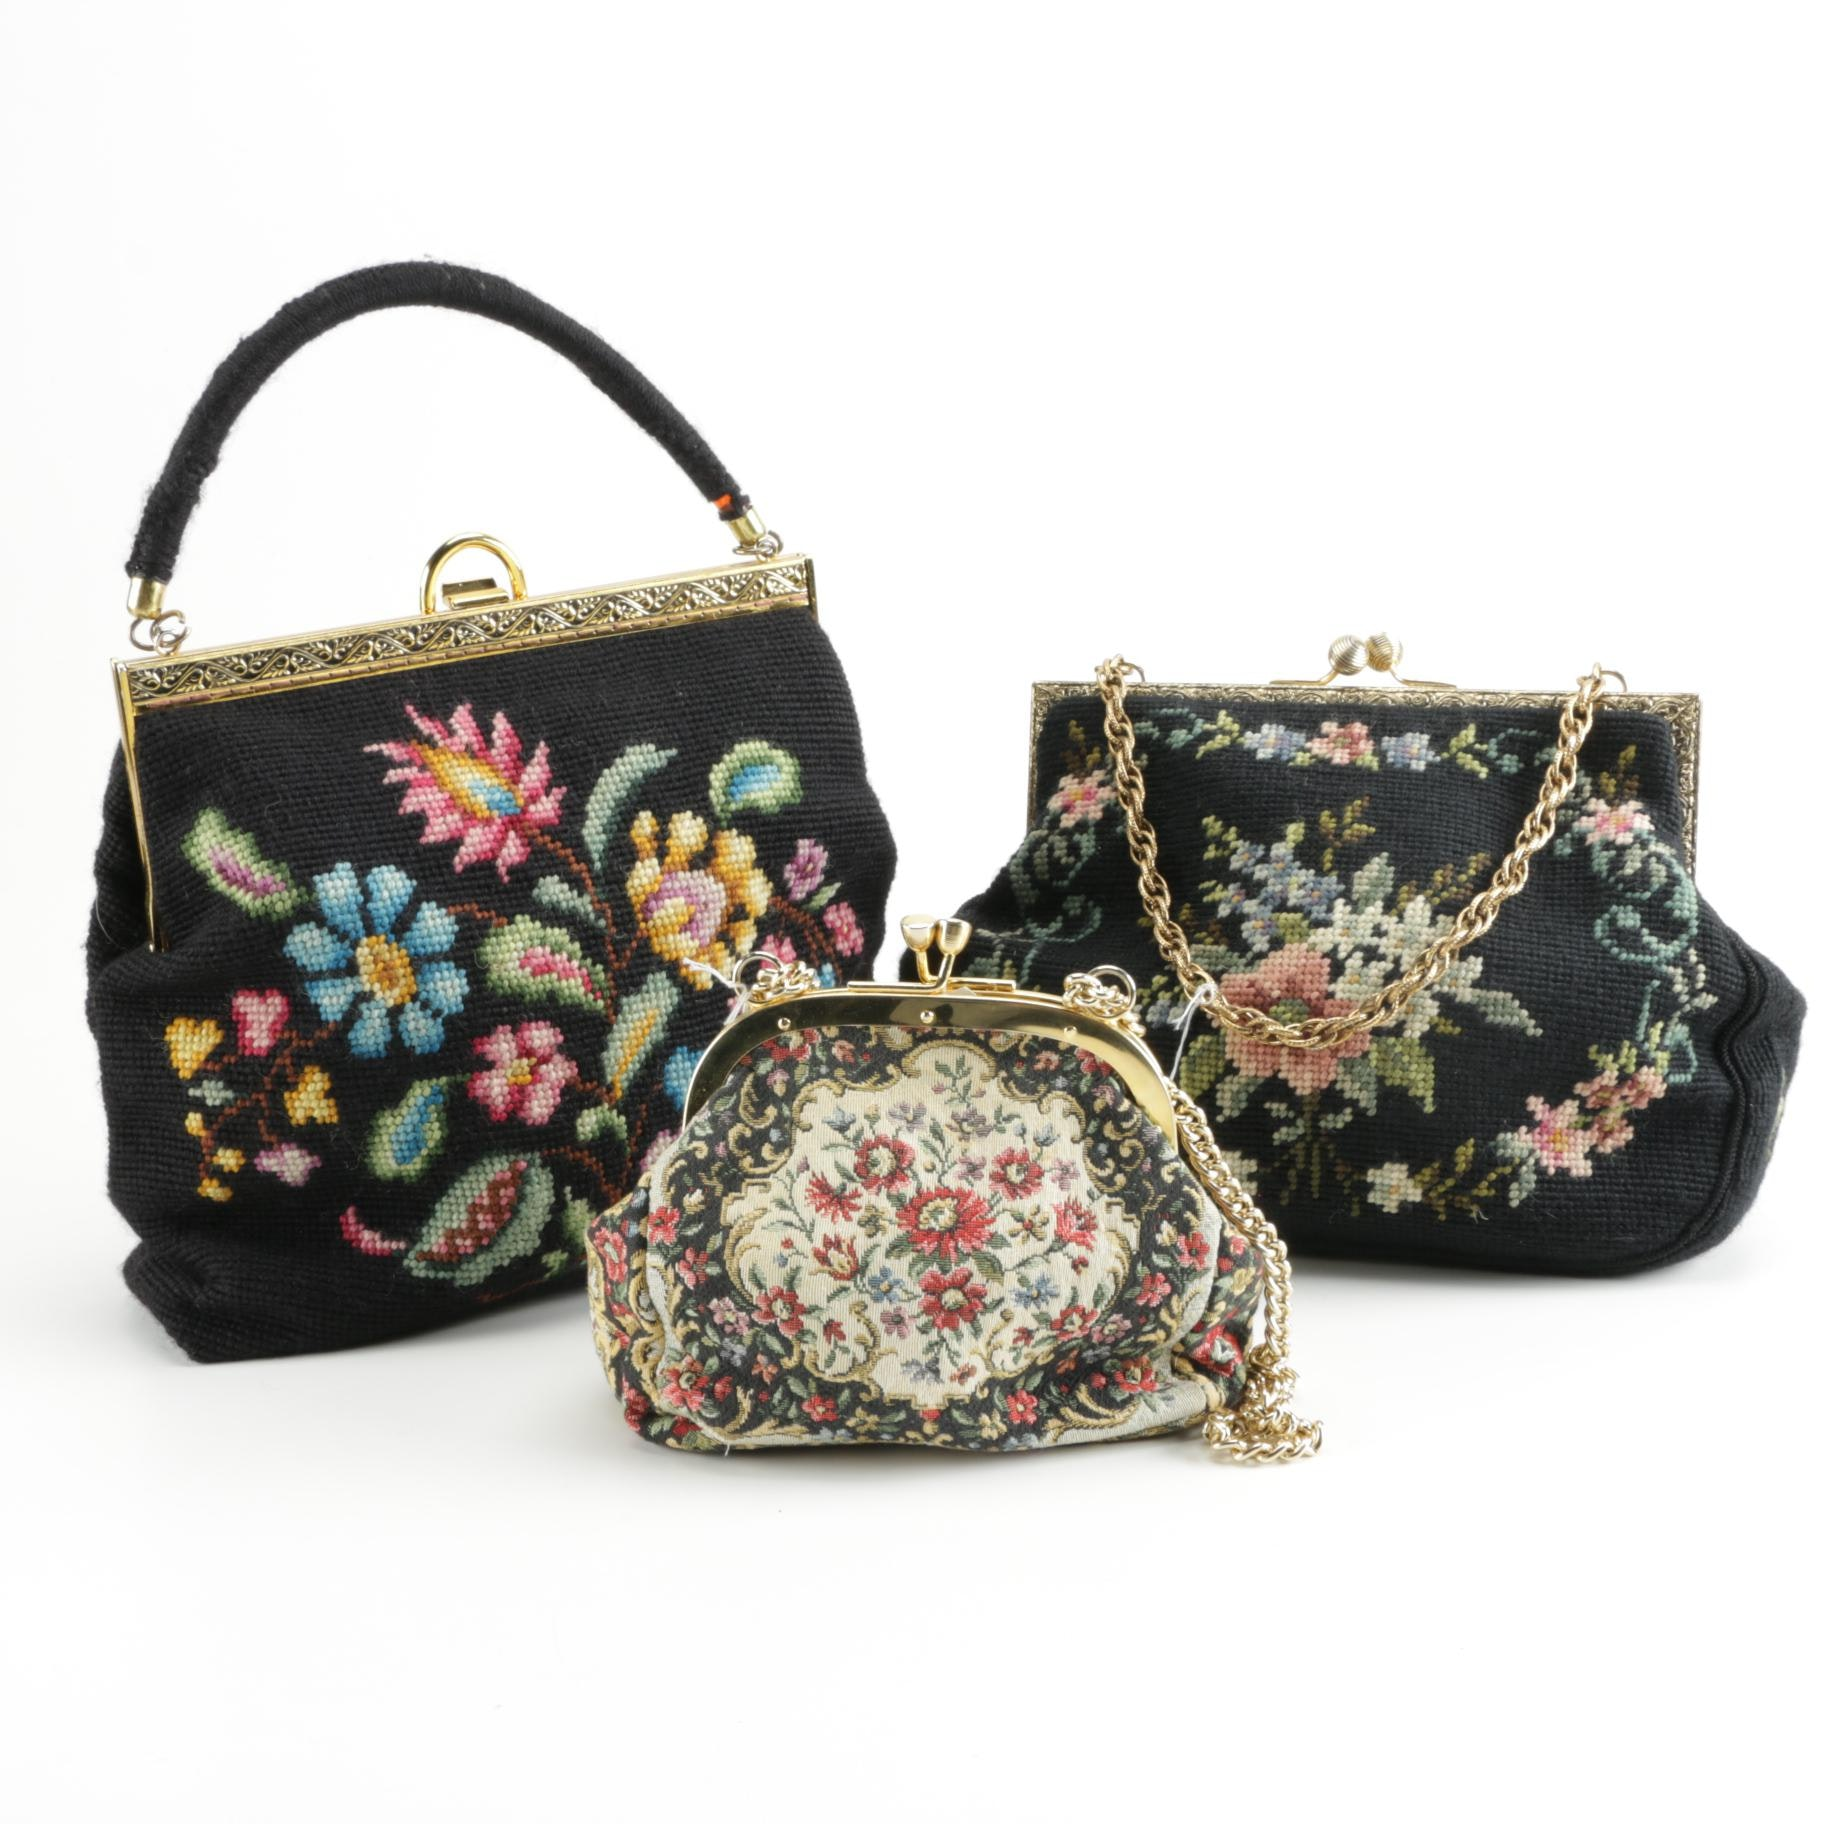 Needlepoint Evening Bags